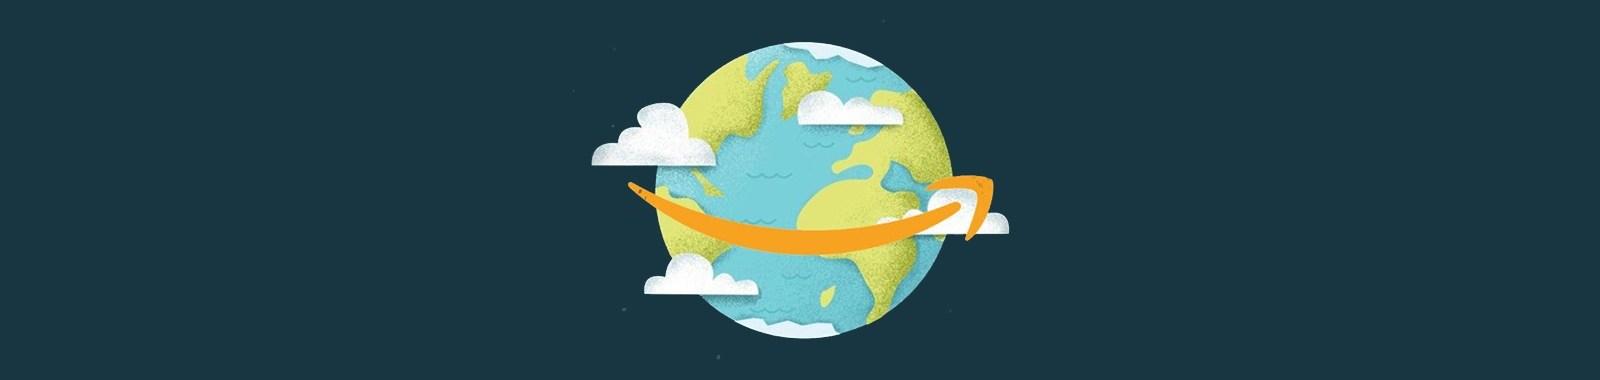 amazon-world1600x440